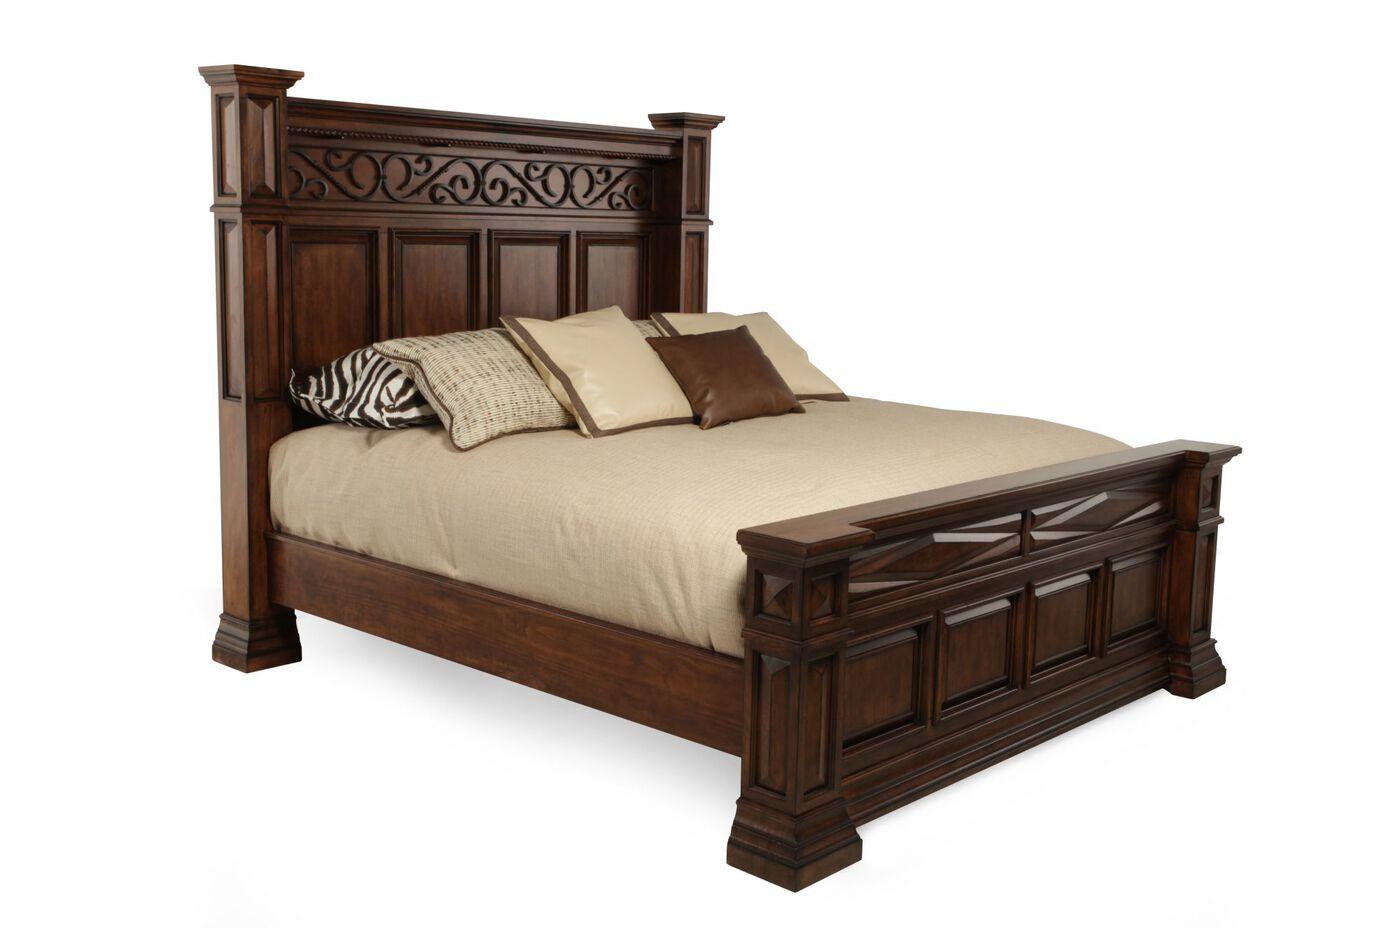 Marbella Bedroom Furniture Art Furniture Marbella Panel Bed Mathis Brothers Furniture